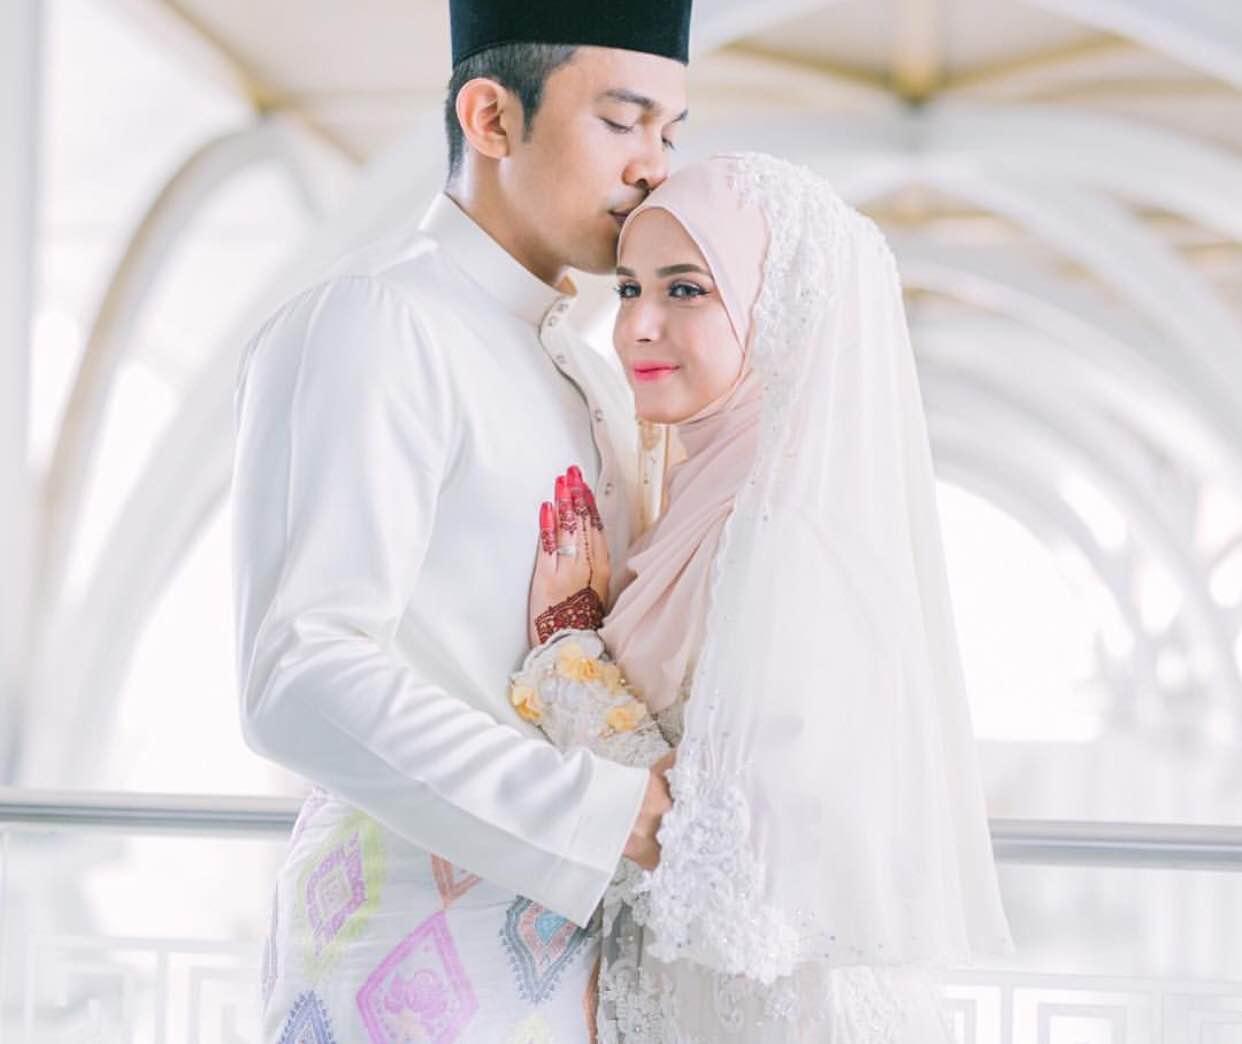 Gambar Pernikahan Saharul Ridzwan Deena Emir